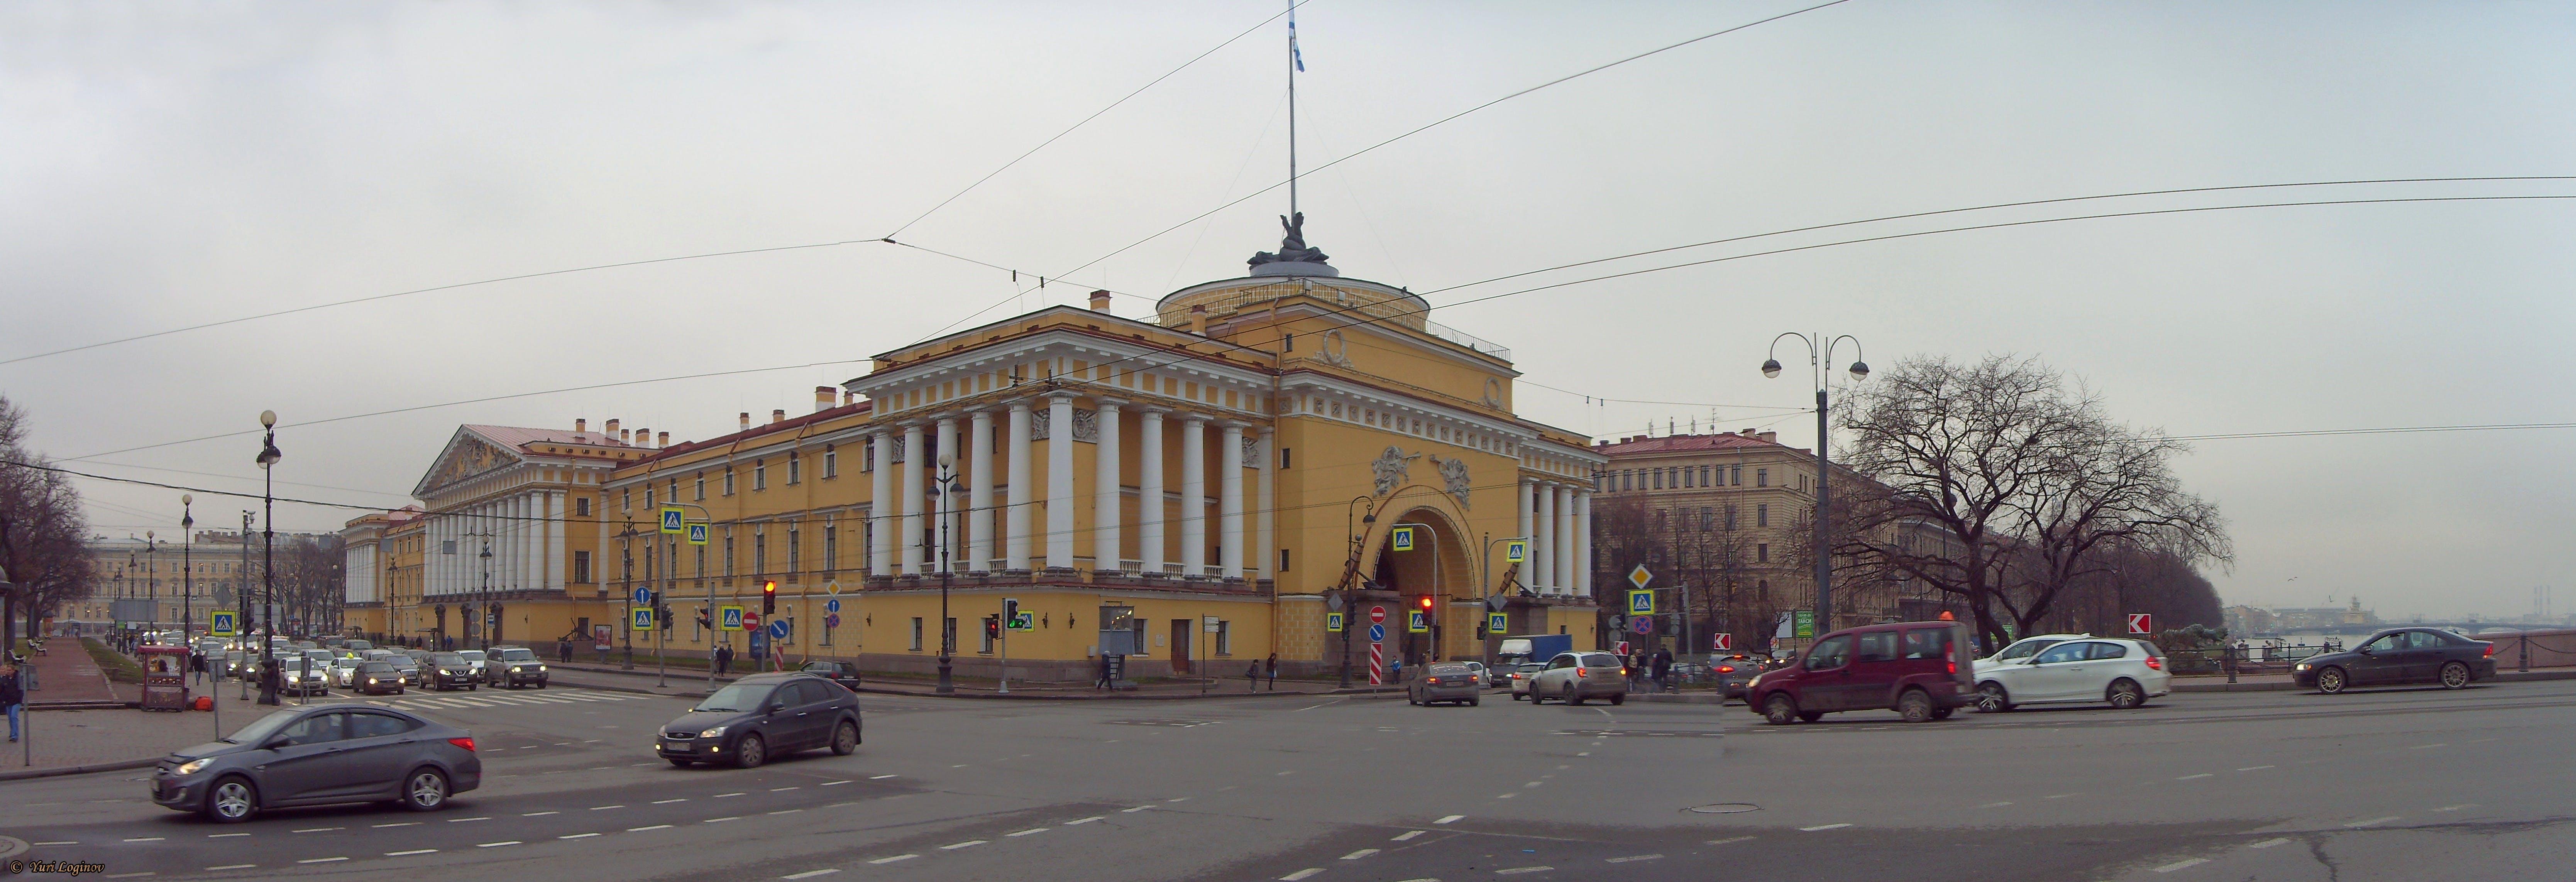 Free stock photo of russia, saint petersburg, россия, санкт-петербург